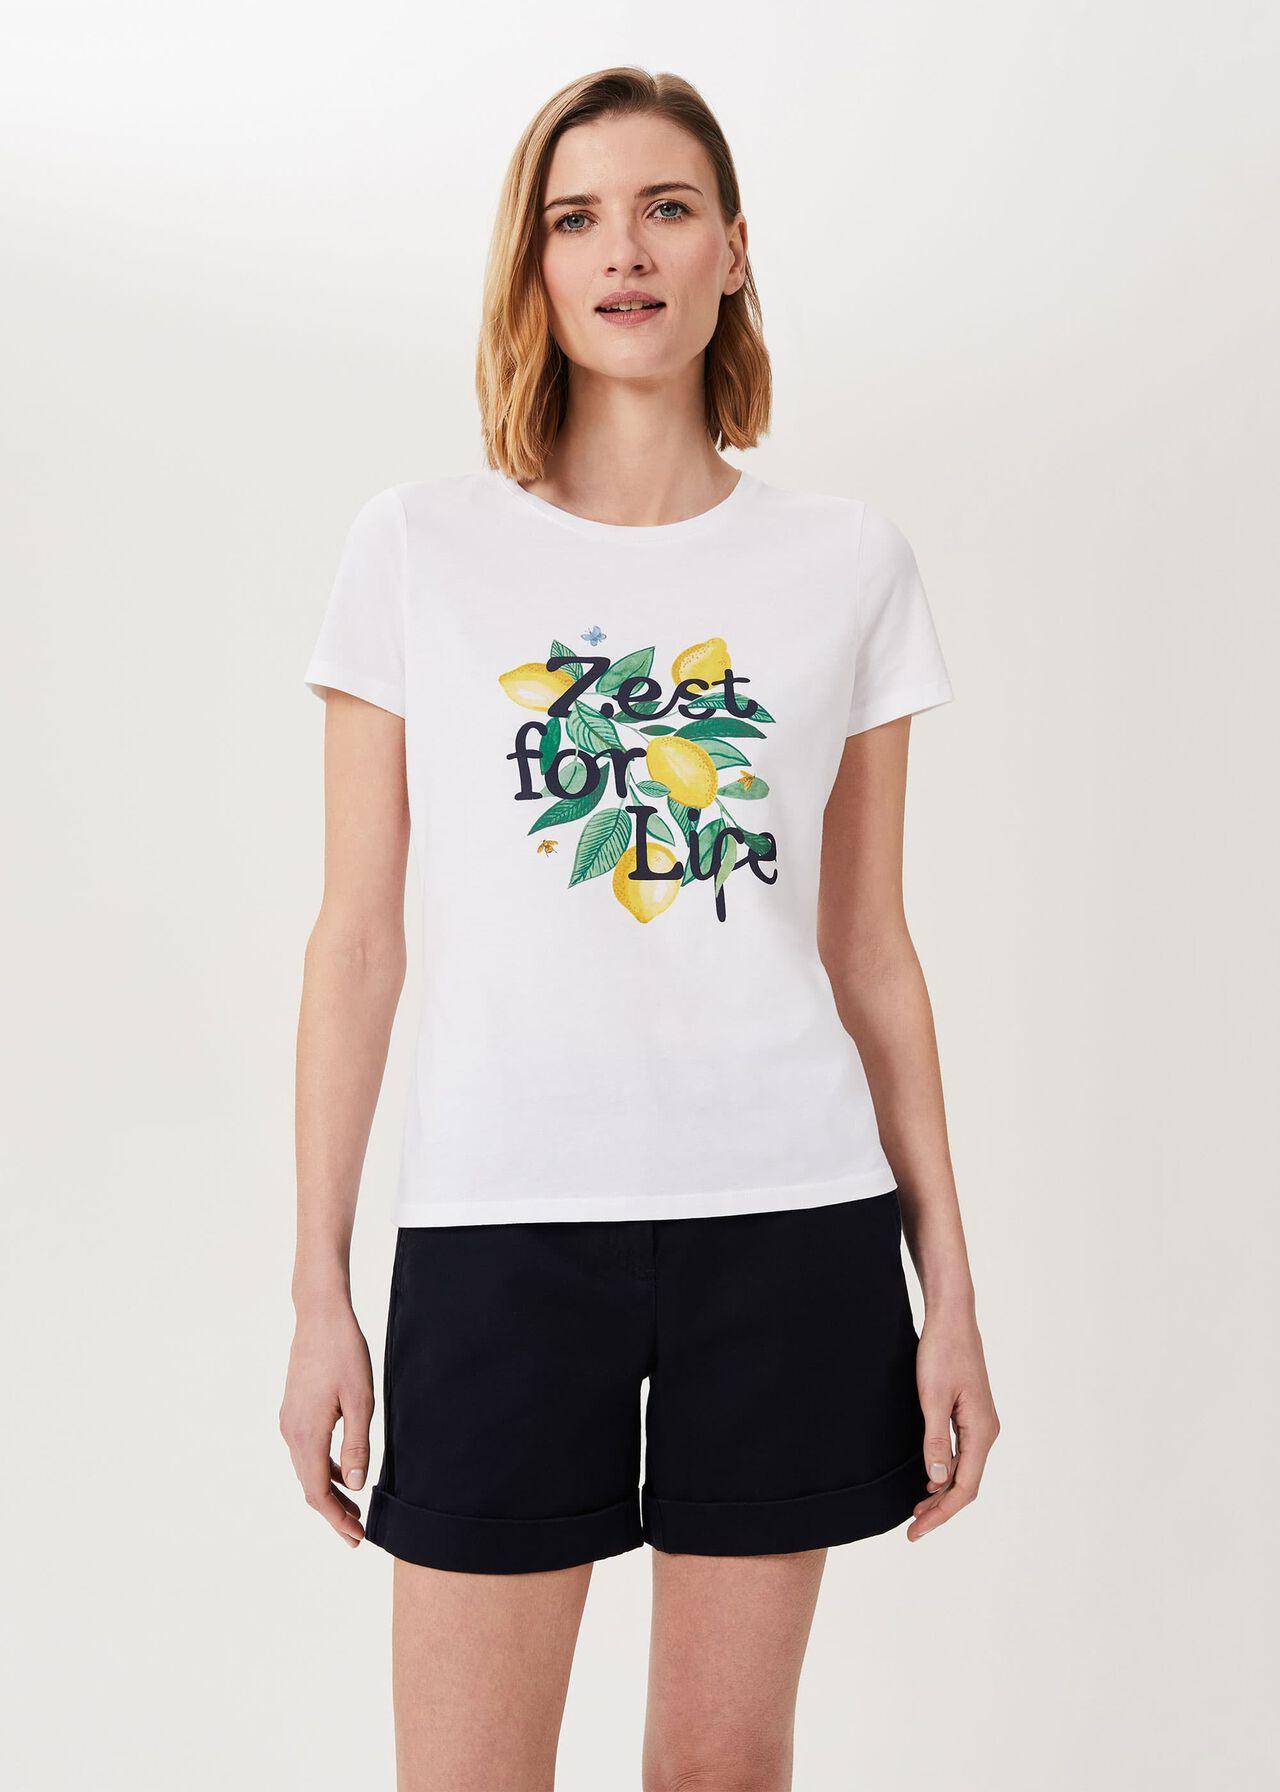 Hobbs Femmes Coton Blanc Bleu cobalt à Rayures Imprimé Pixie T-shirt XS NEUF